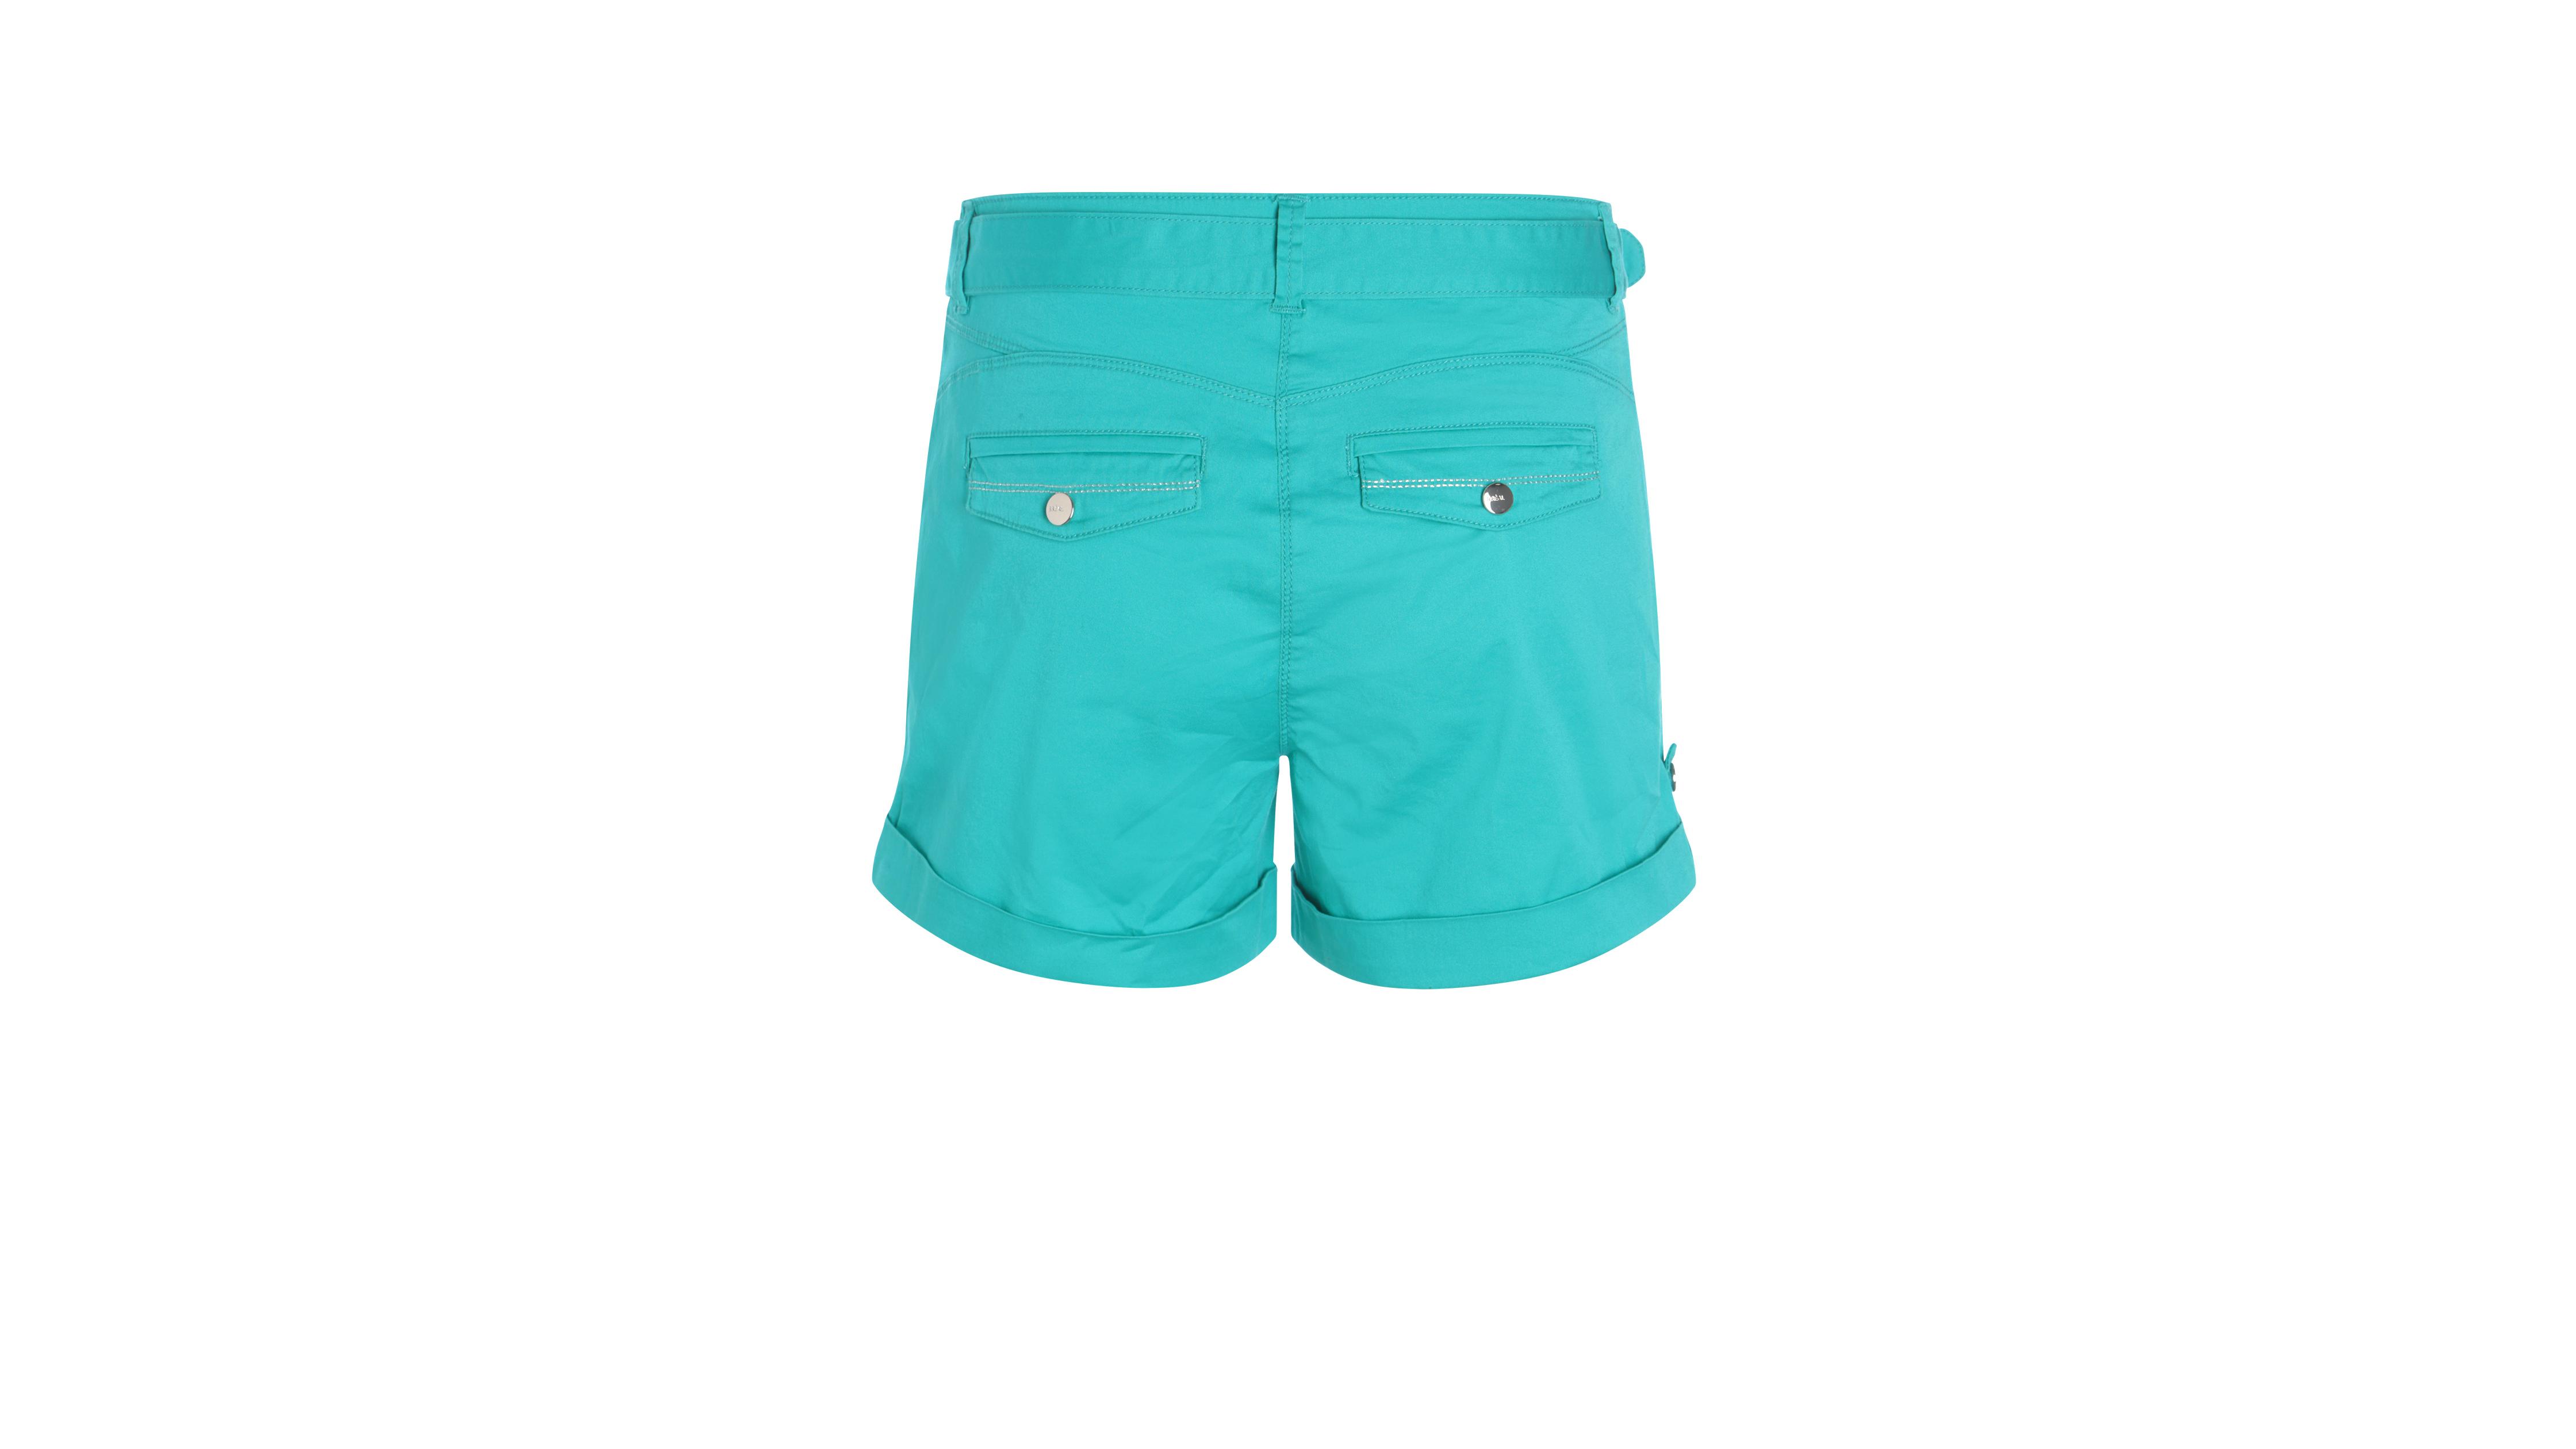 Turquoise Uni Femme Assortie Ceinture Short Avec Vert K1JlcF